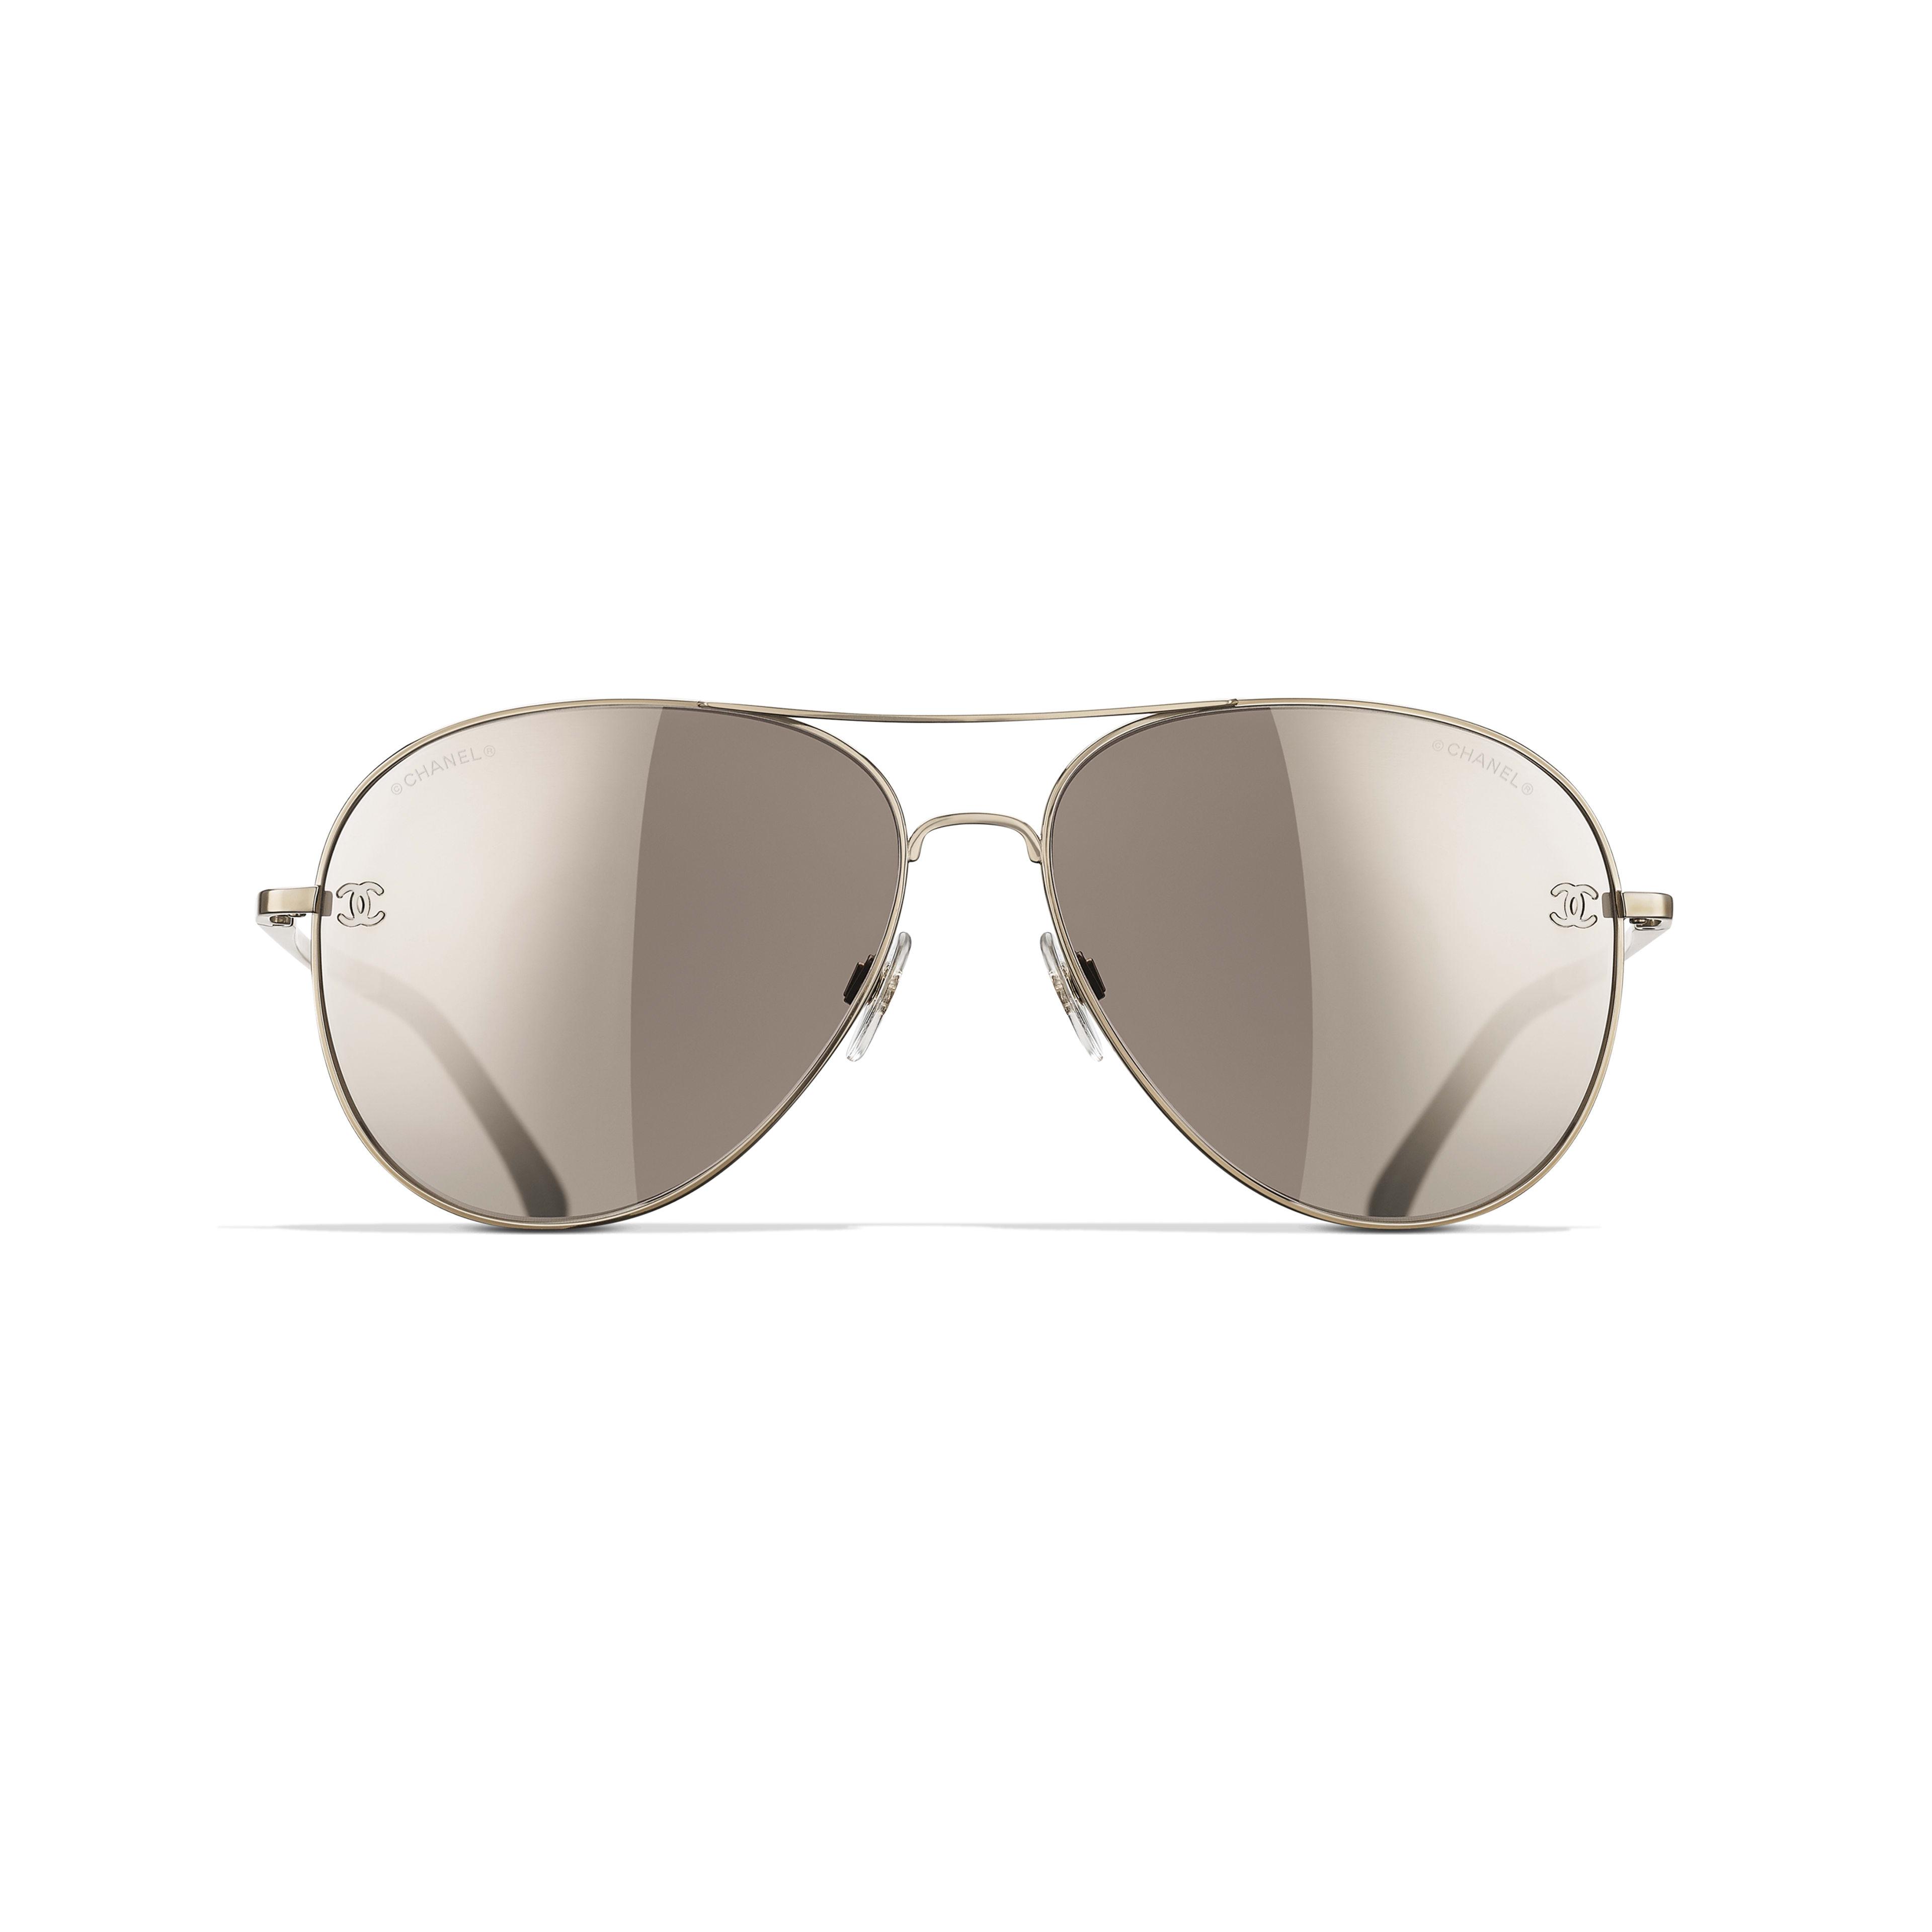 Pilot Sunglasses Gold Brown Eyewear Chanel